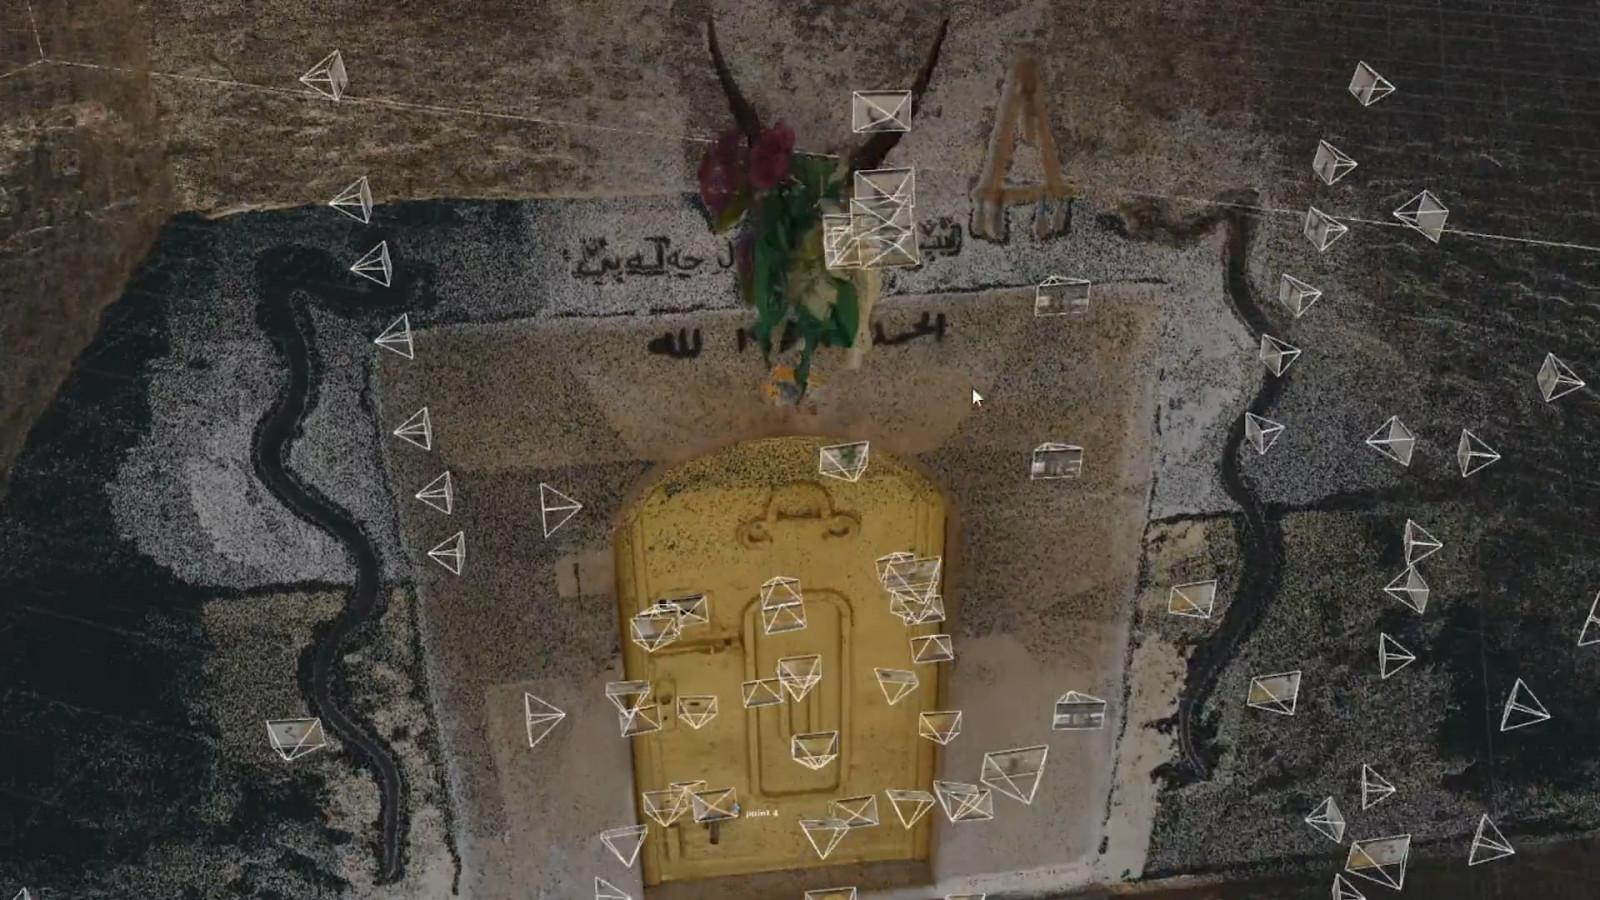 The Destruction of Yazidi Cultural Heritage